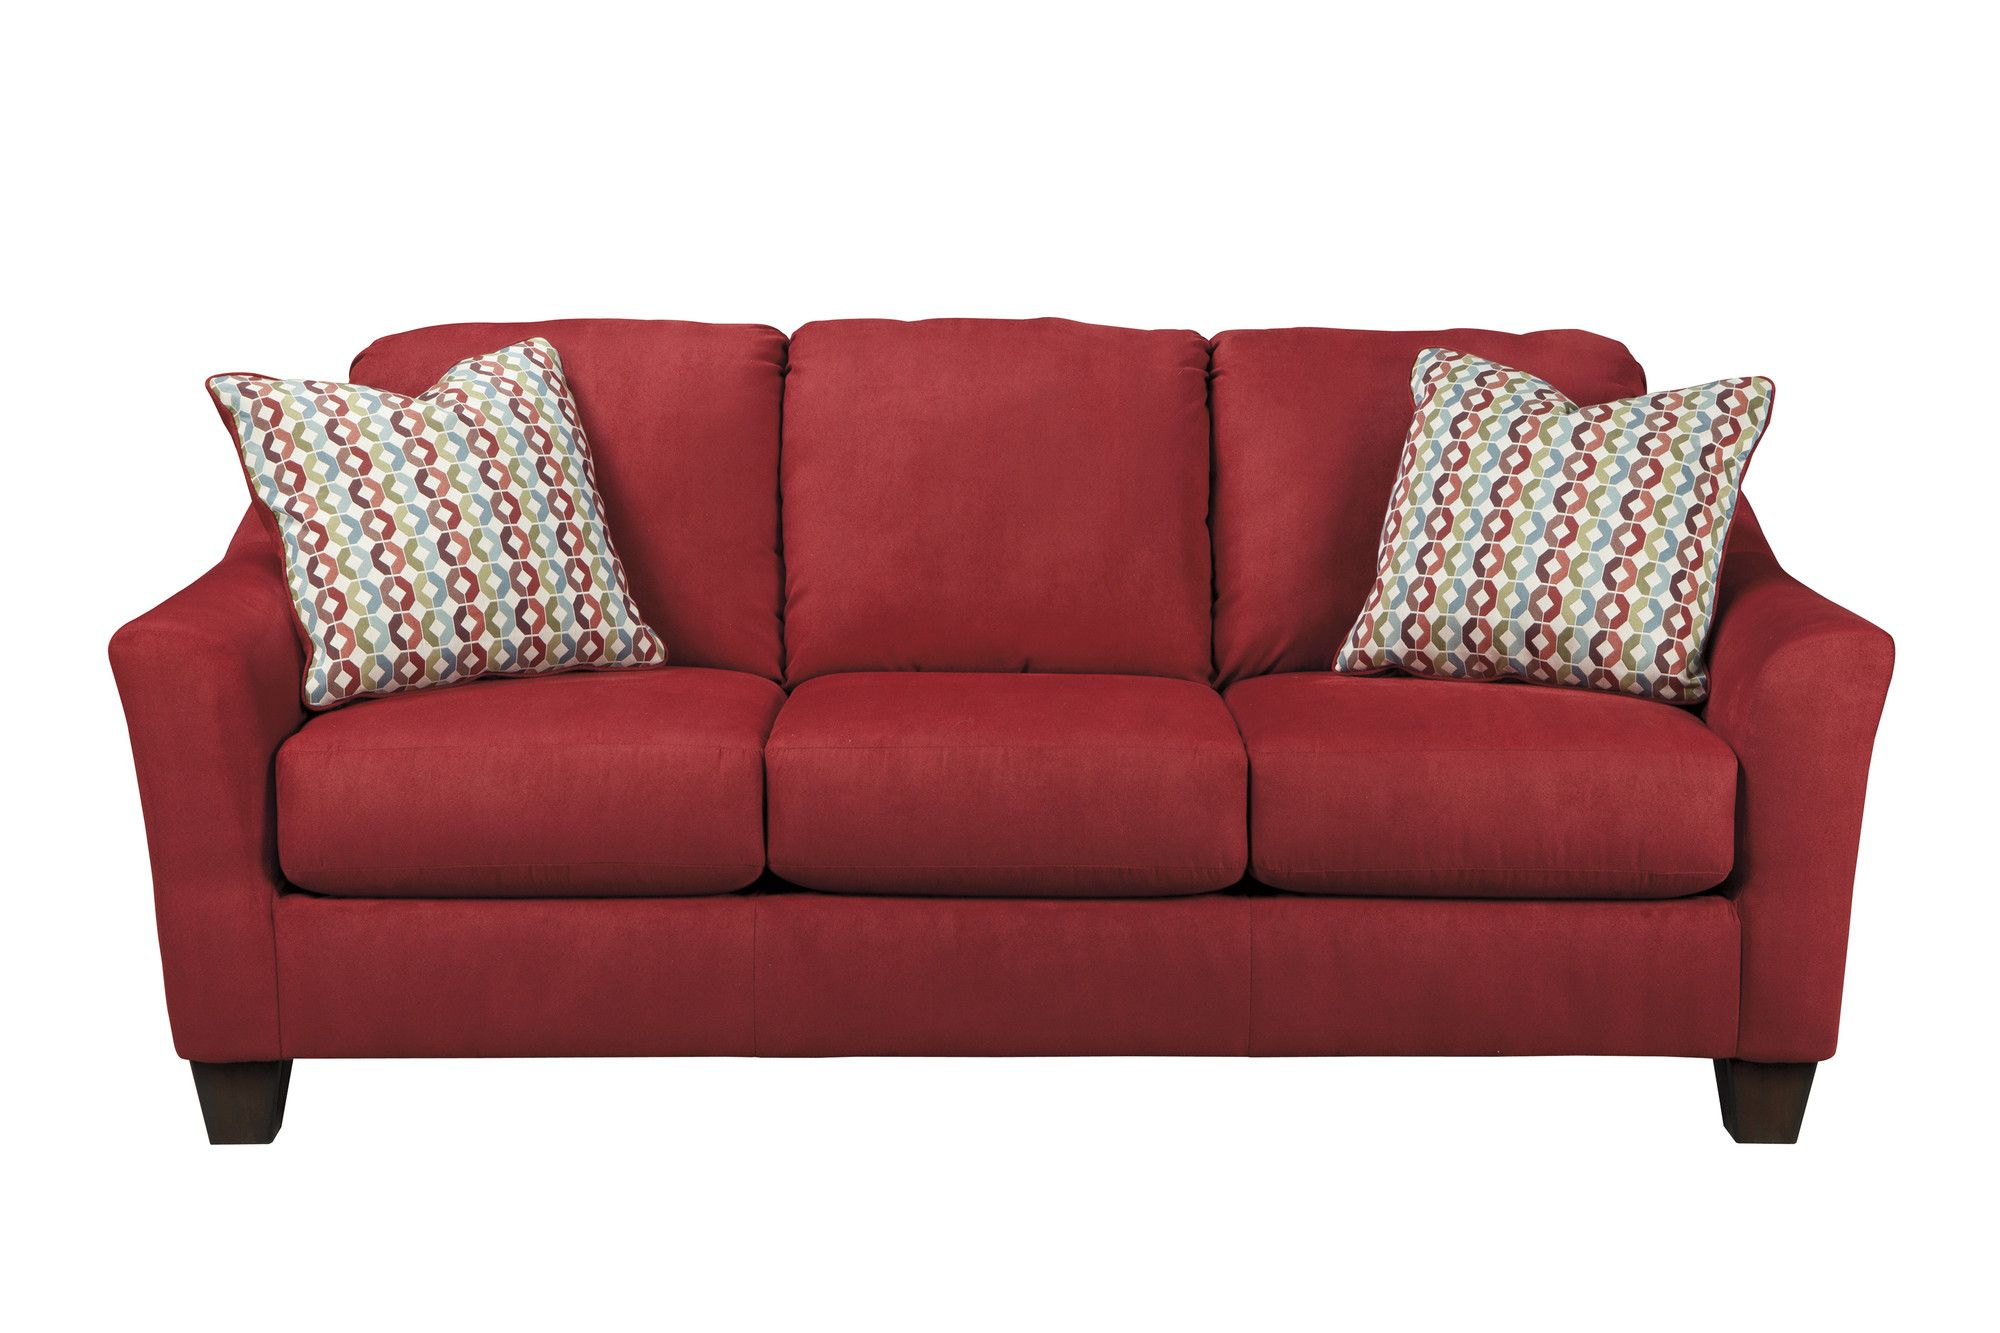 Wondrous Youll Love The Miranda 82 Sleeper Sofa At Joss Main Interior Design Ideas Gentotthenellocom